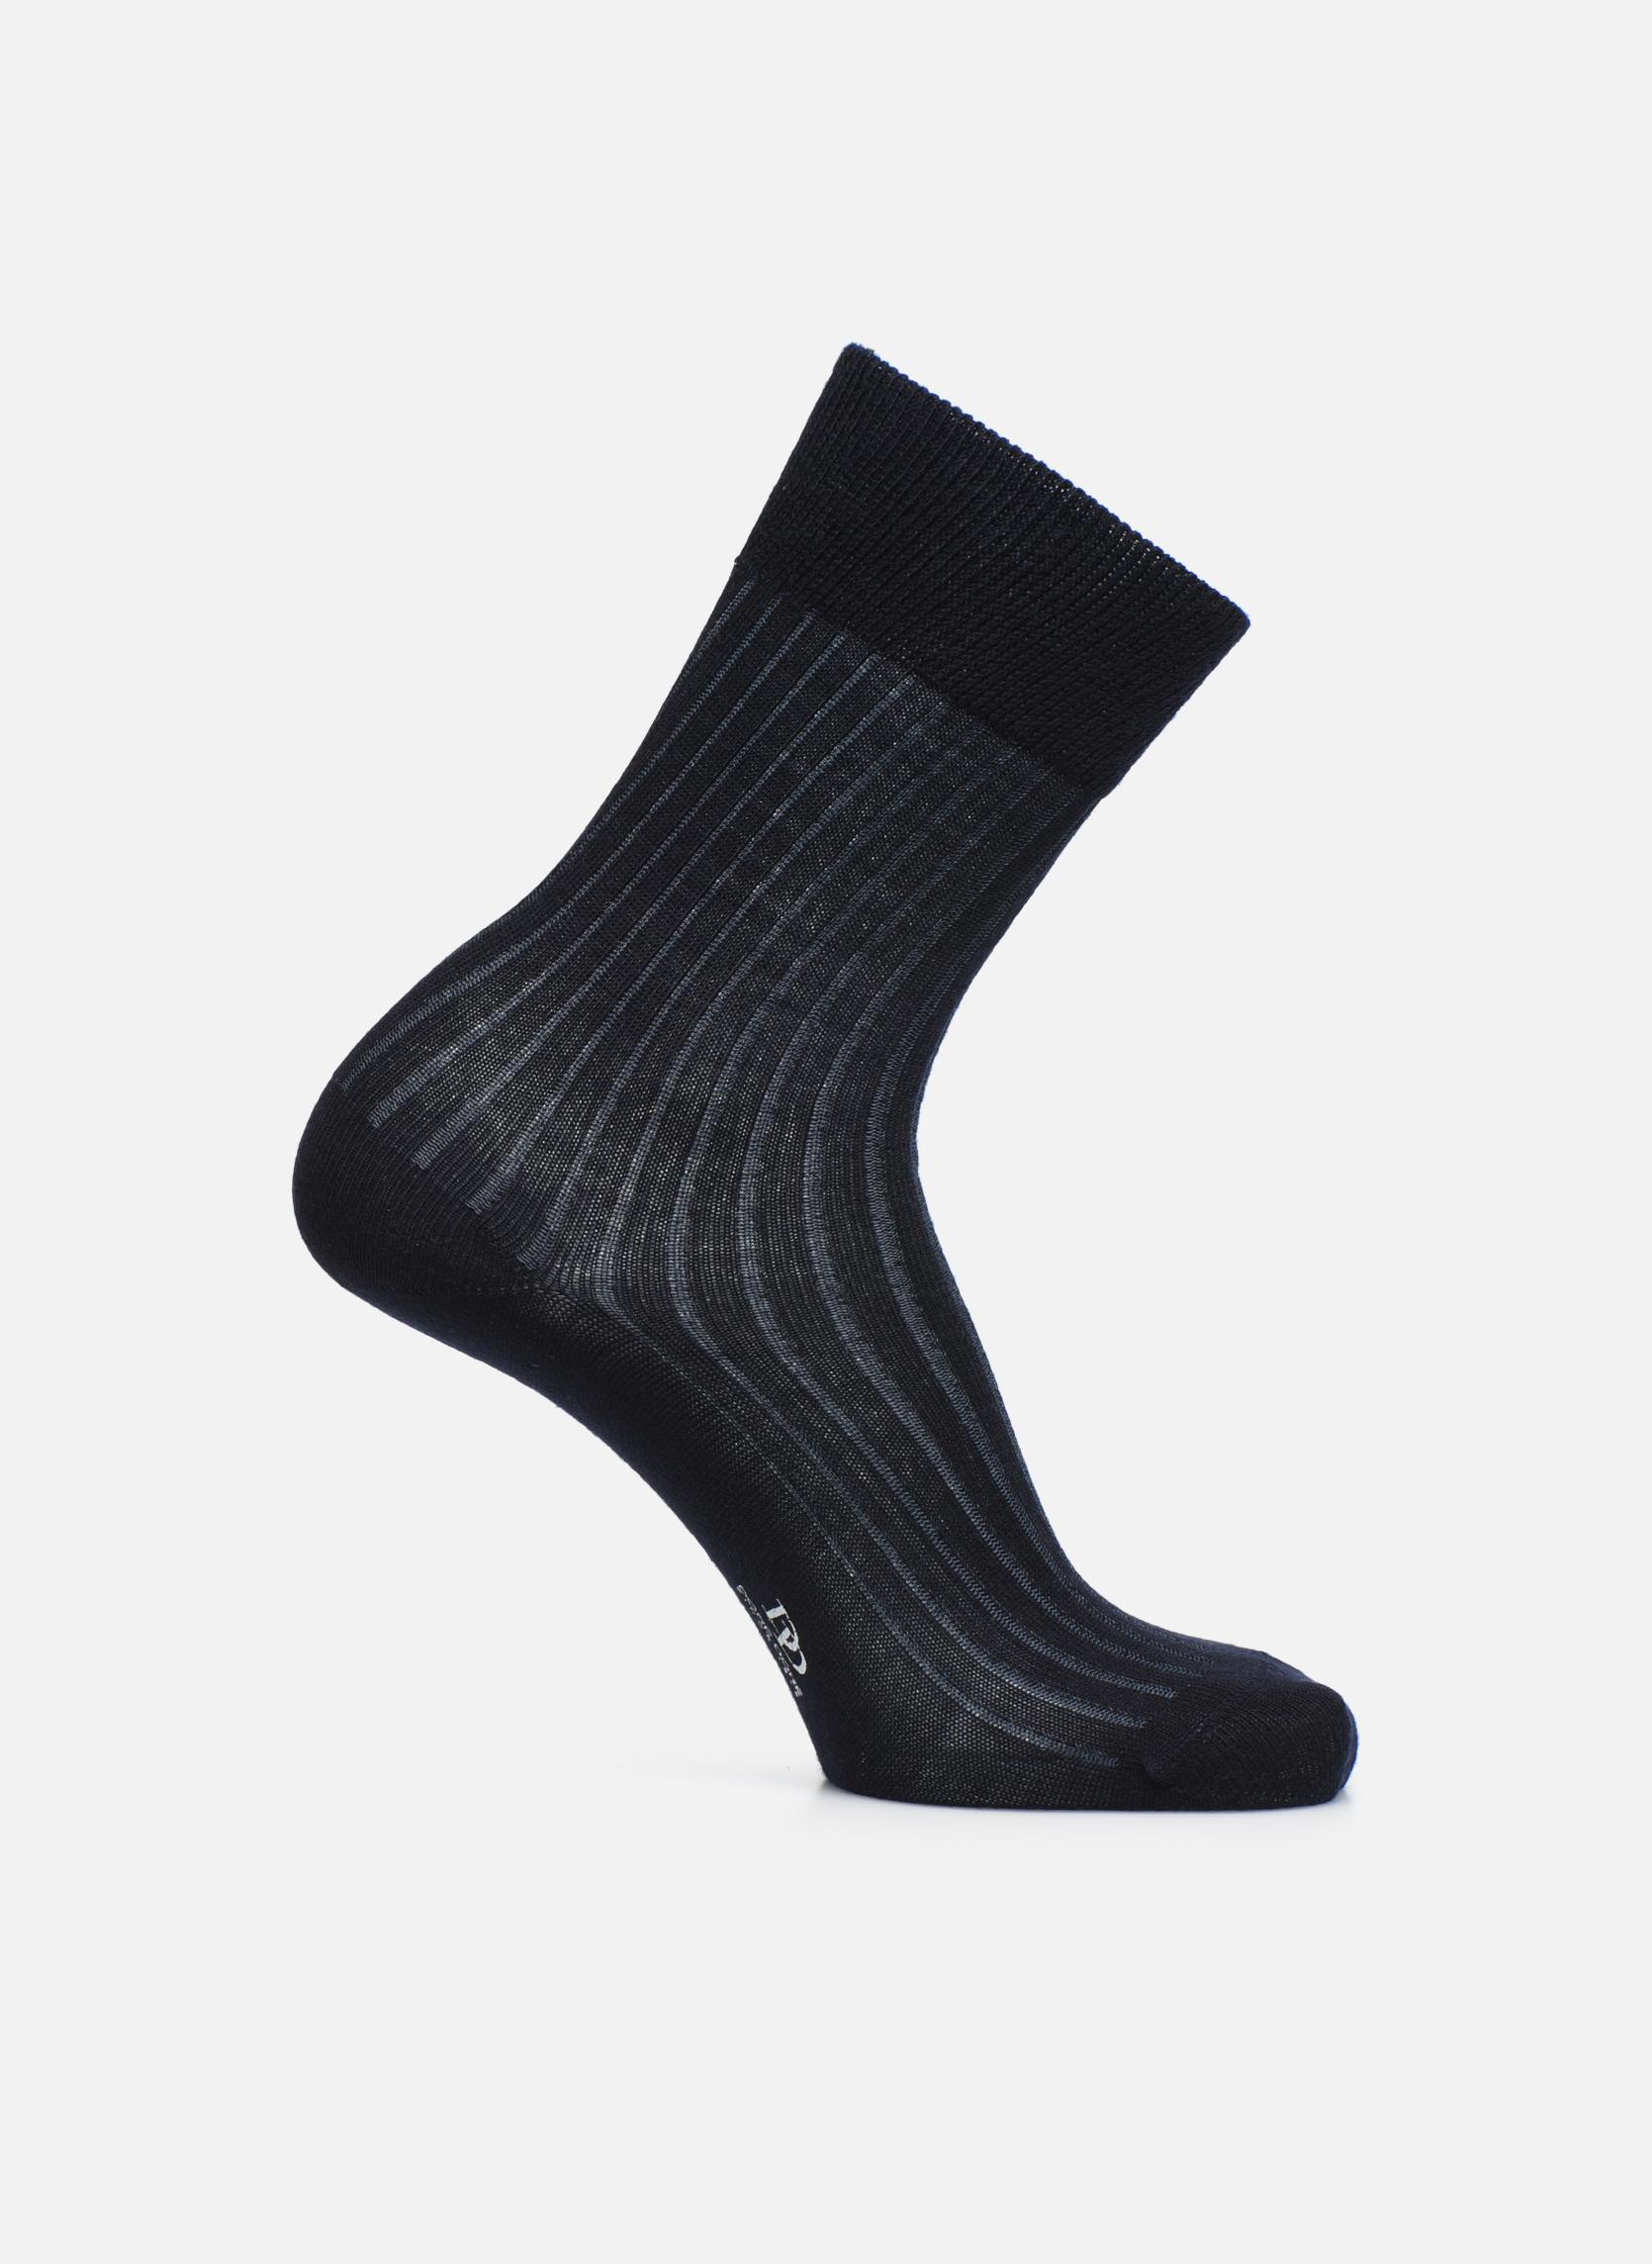 Socken & Strumpfhosen Accessoires Socken SUBTILE